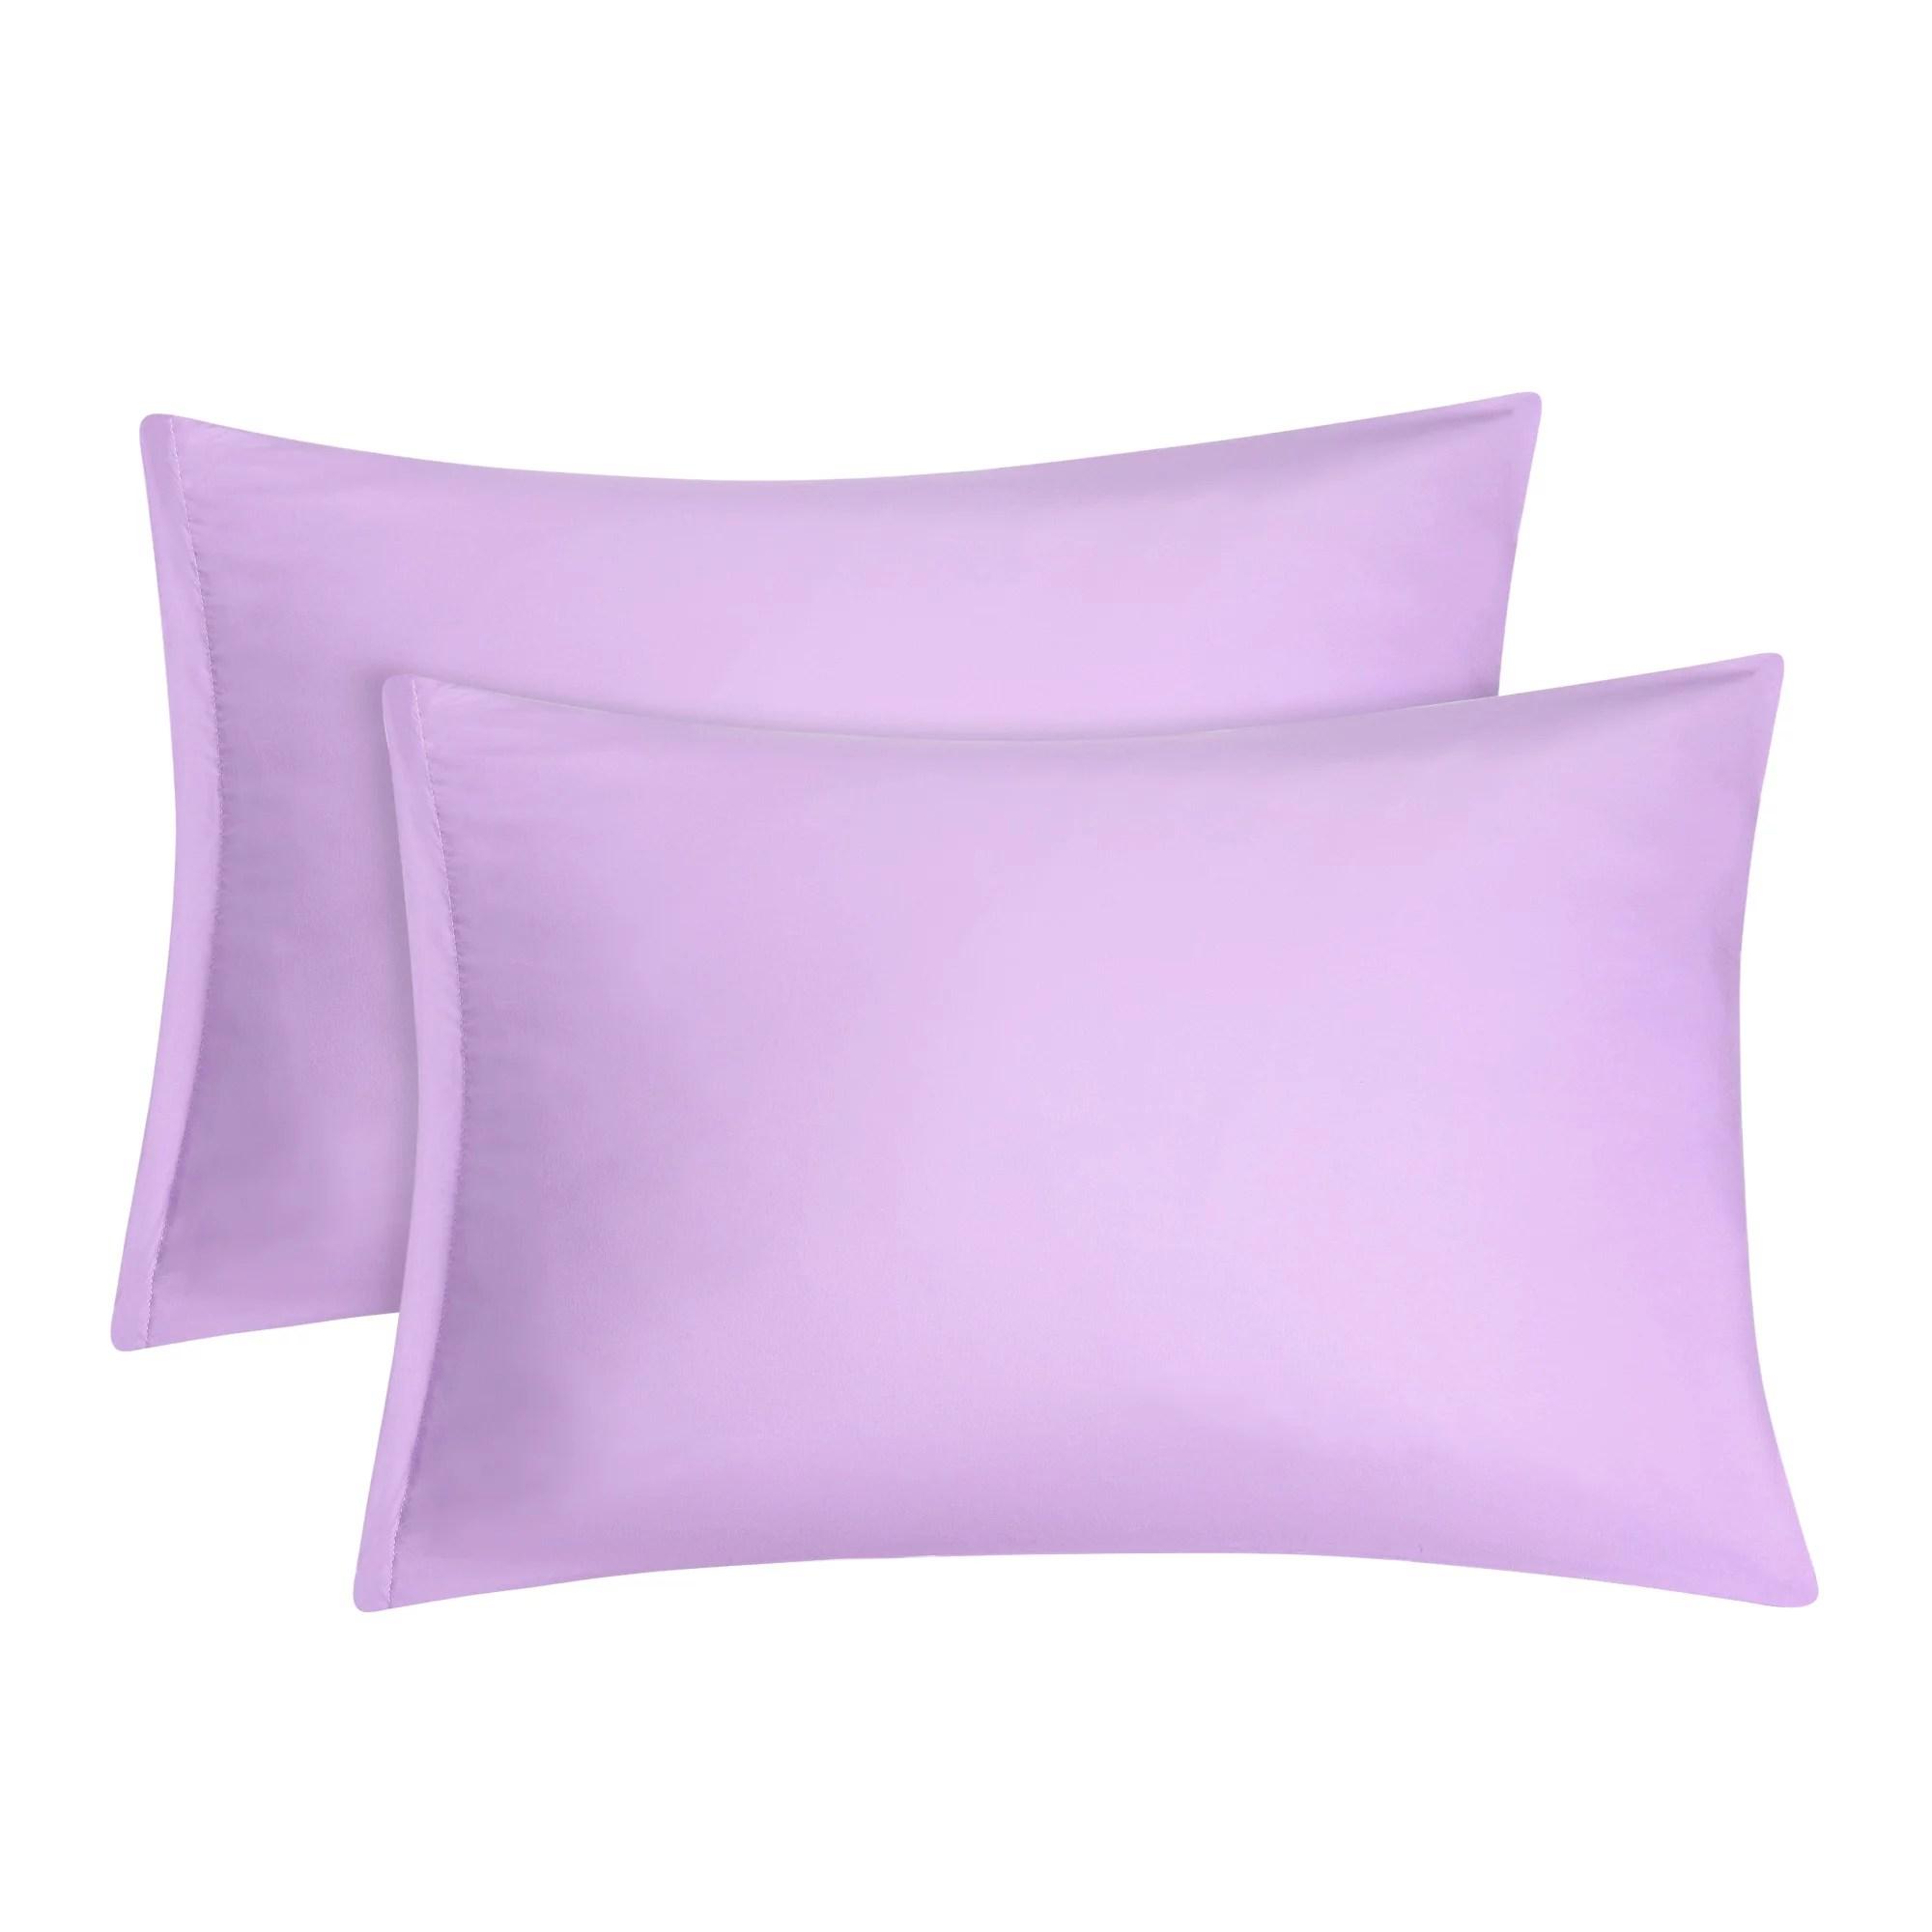 2 pack standard pillowcases soft 1800 microfiber pillow case with zipper closure violet bedding pillow covers walmart com